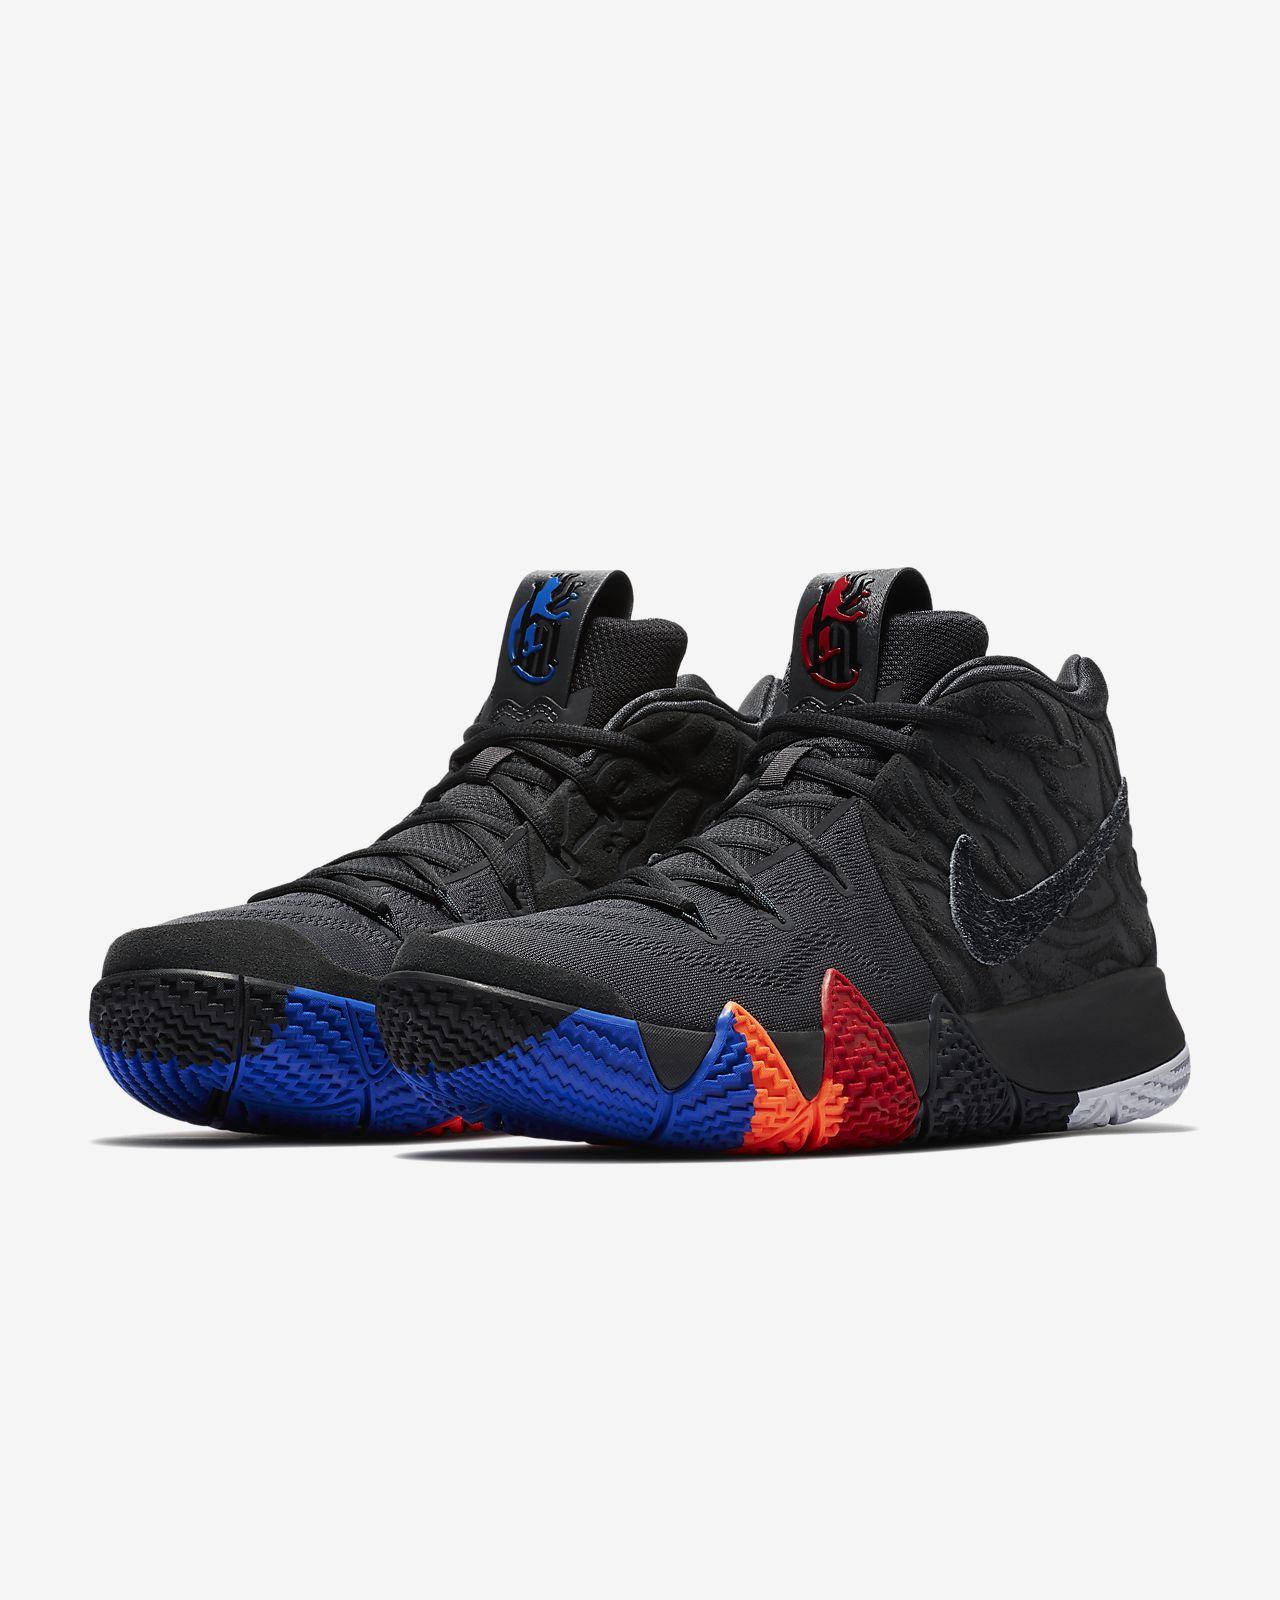 6e91bc4460db Buty do koszykówki Kyrie 4. Nike.com PL